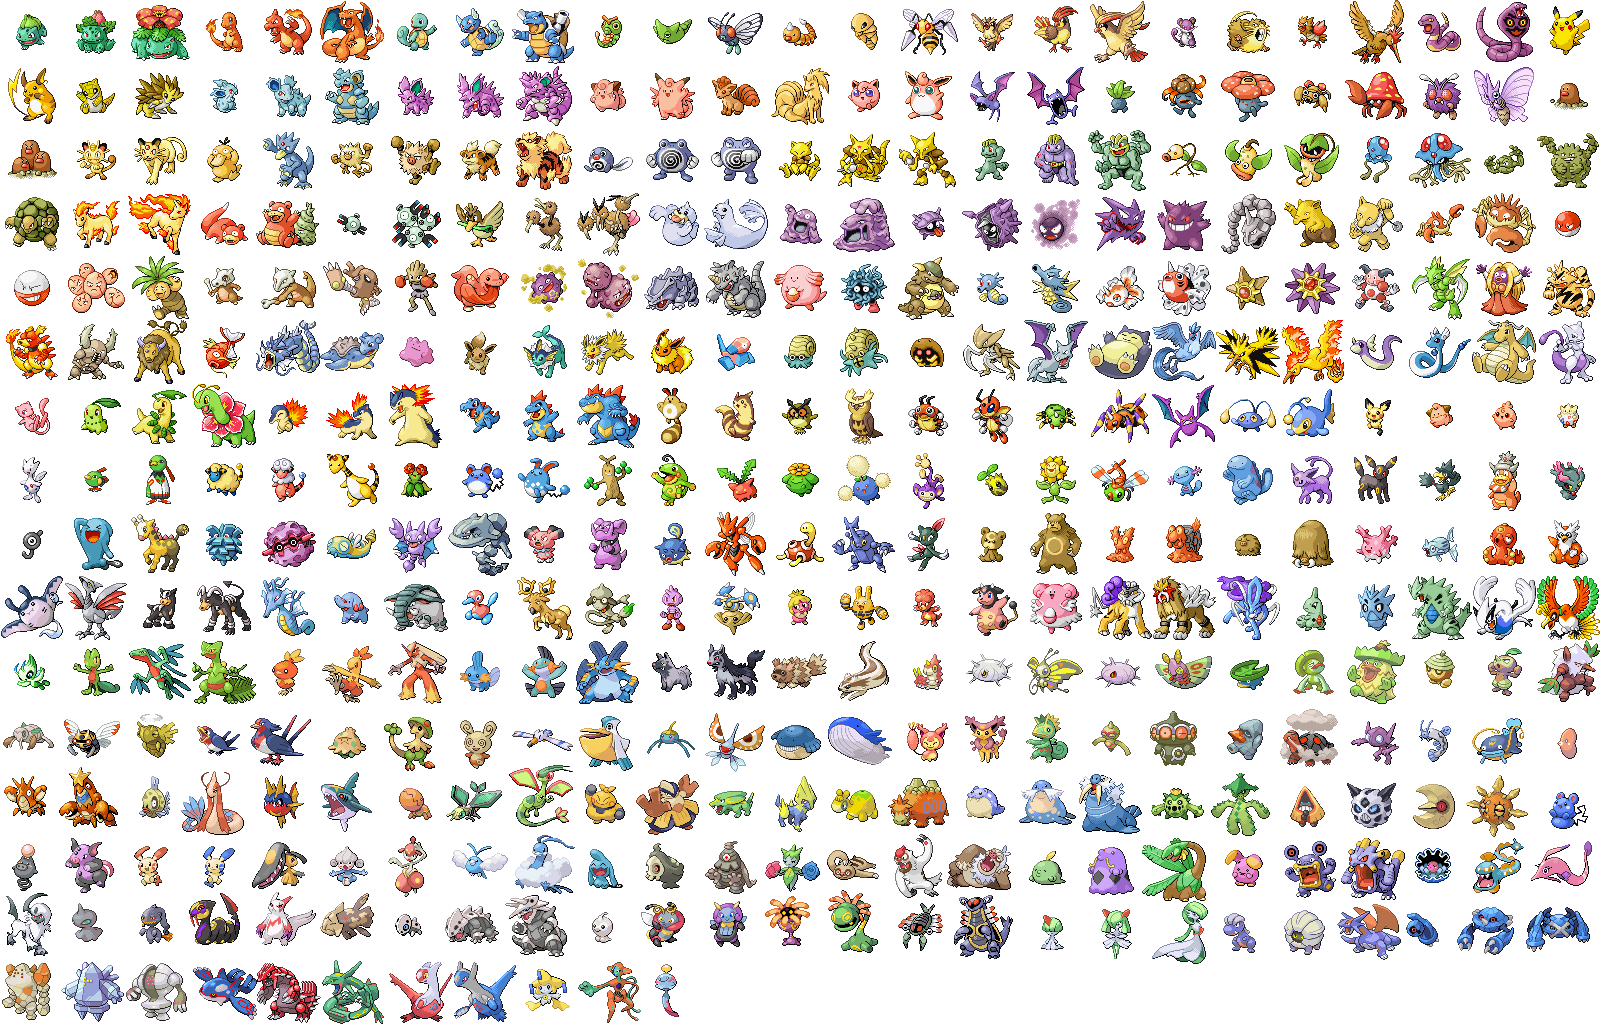 Pokemon Ruby And Sapphire Sprites